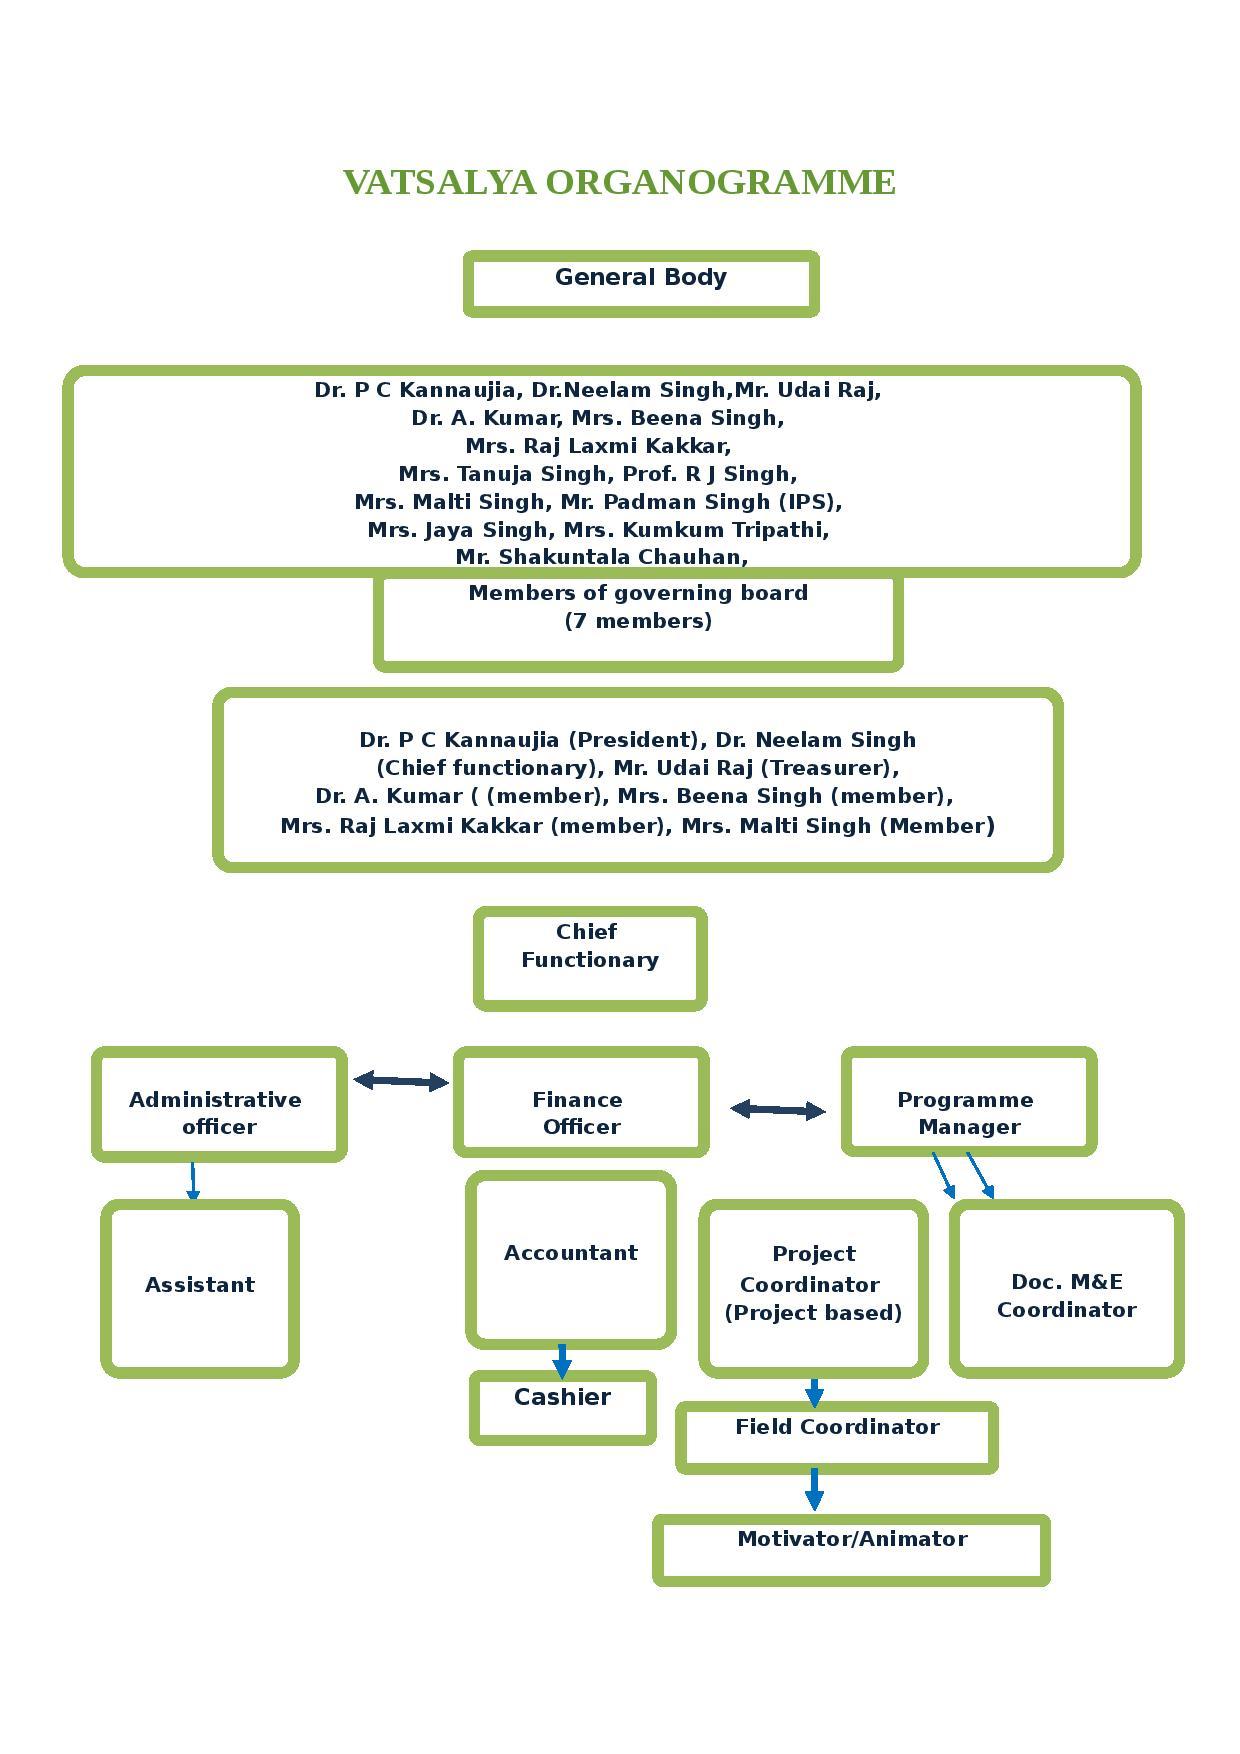 Vatsalya Organogramme